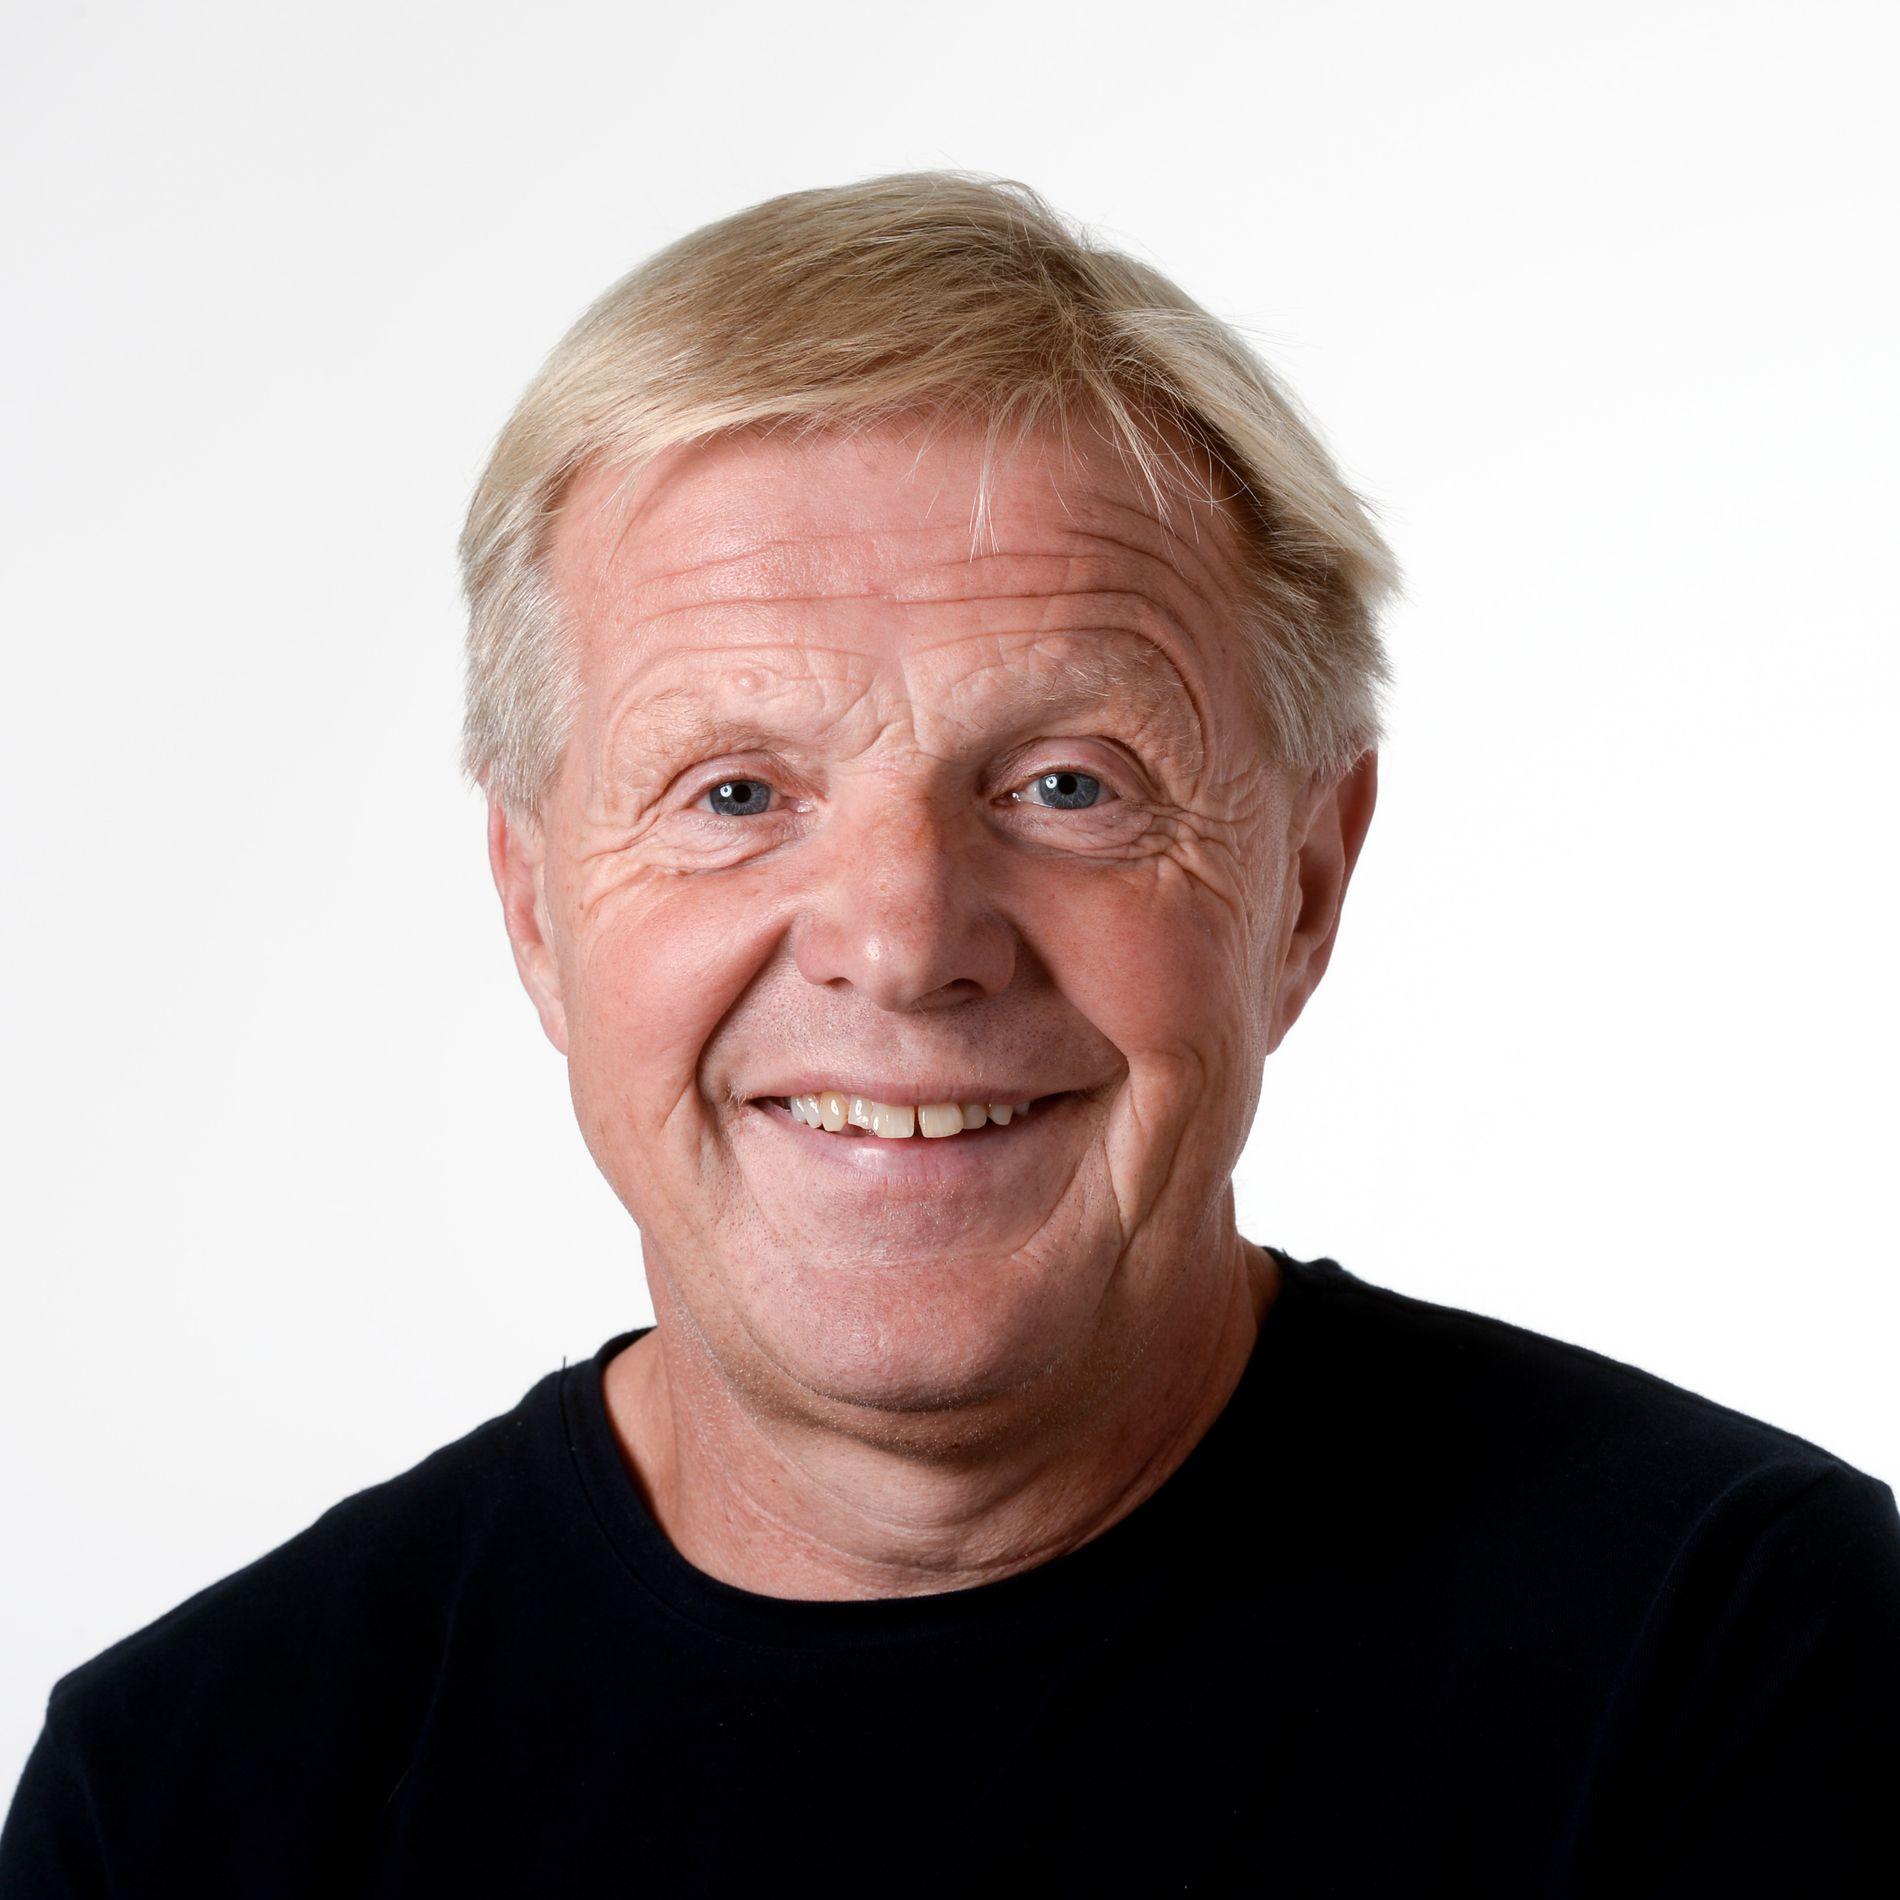 Geir Sveen